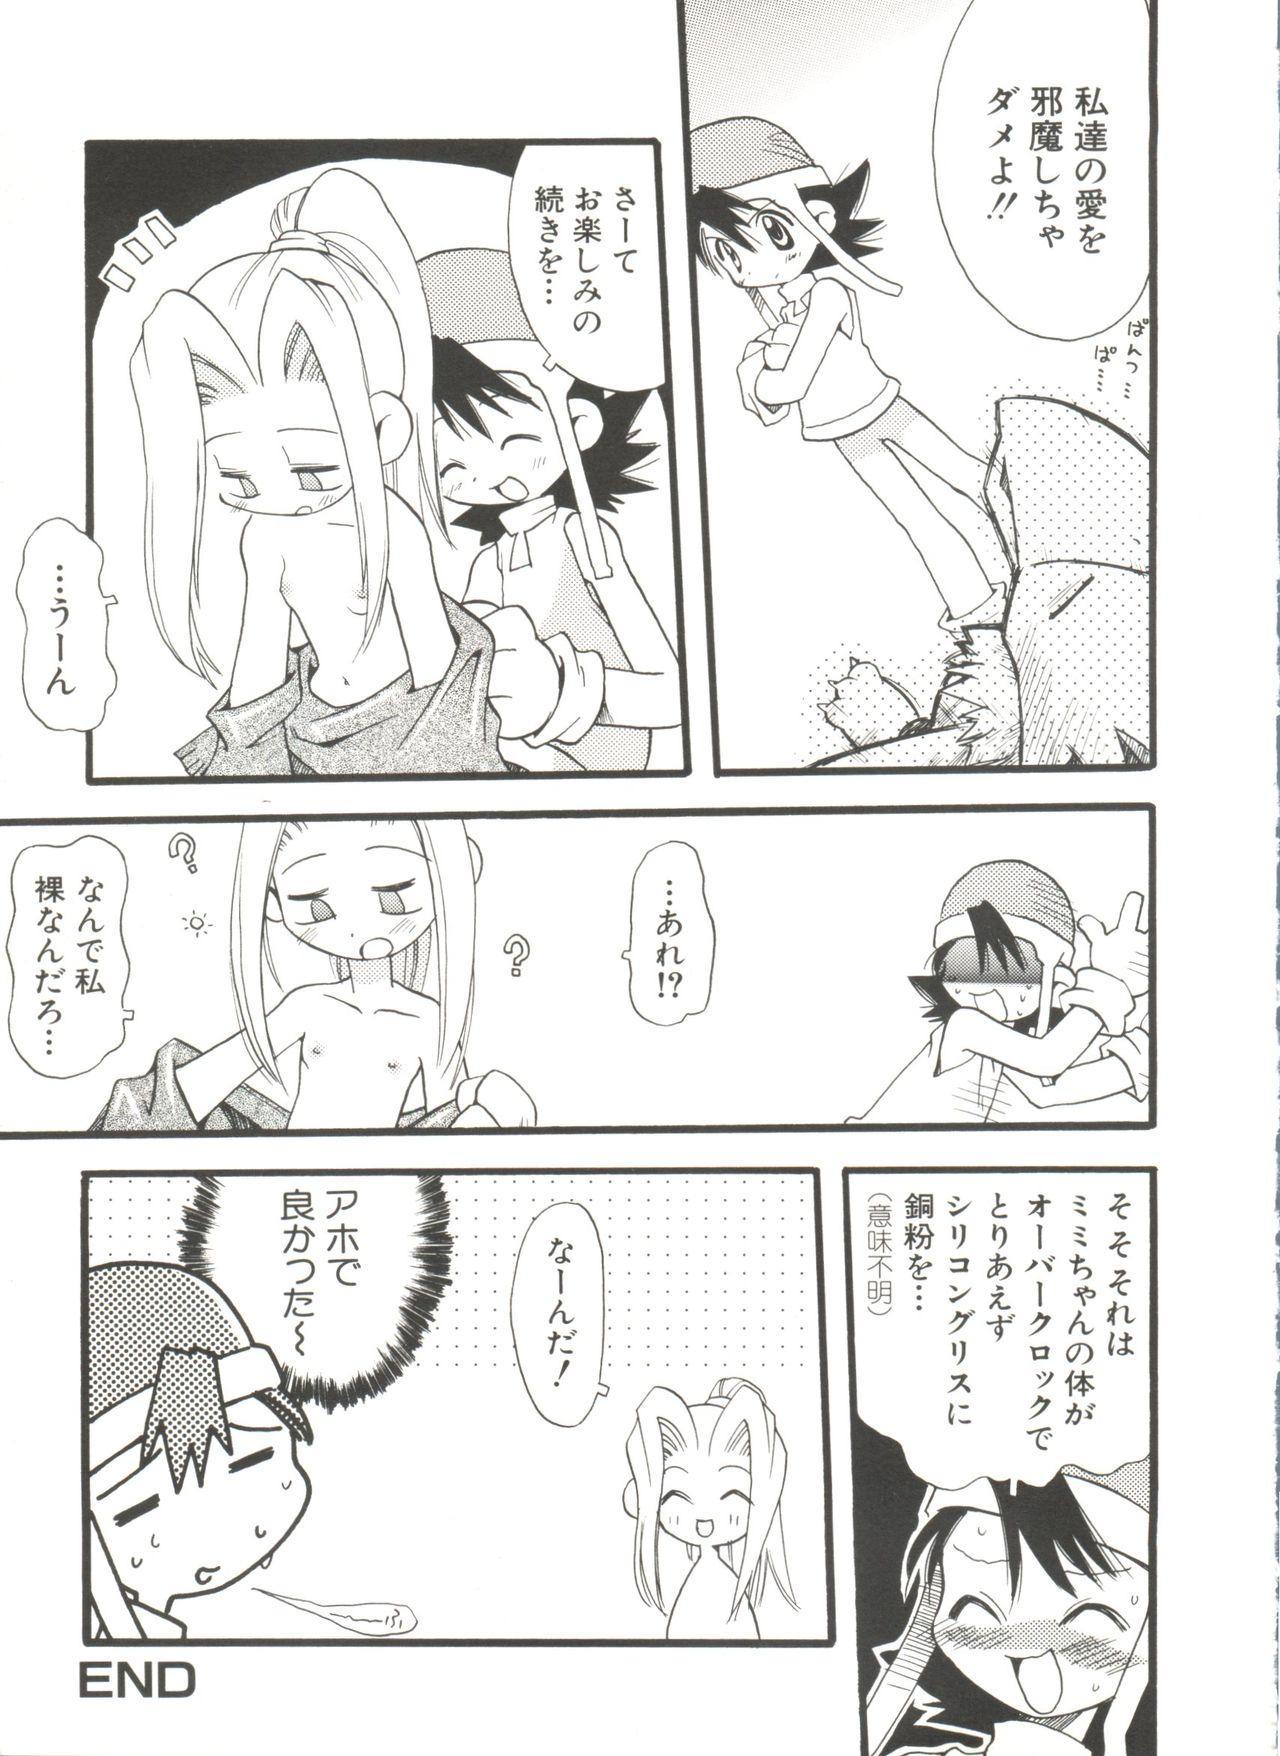 [Anthology] Denei Tamatebako 8 - Utakata no Tenshi-tachi II (Various) 42